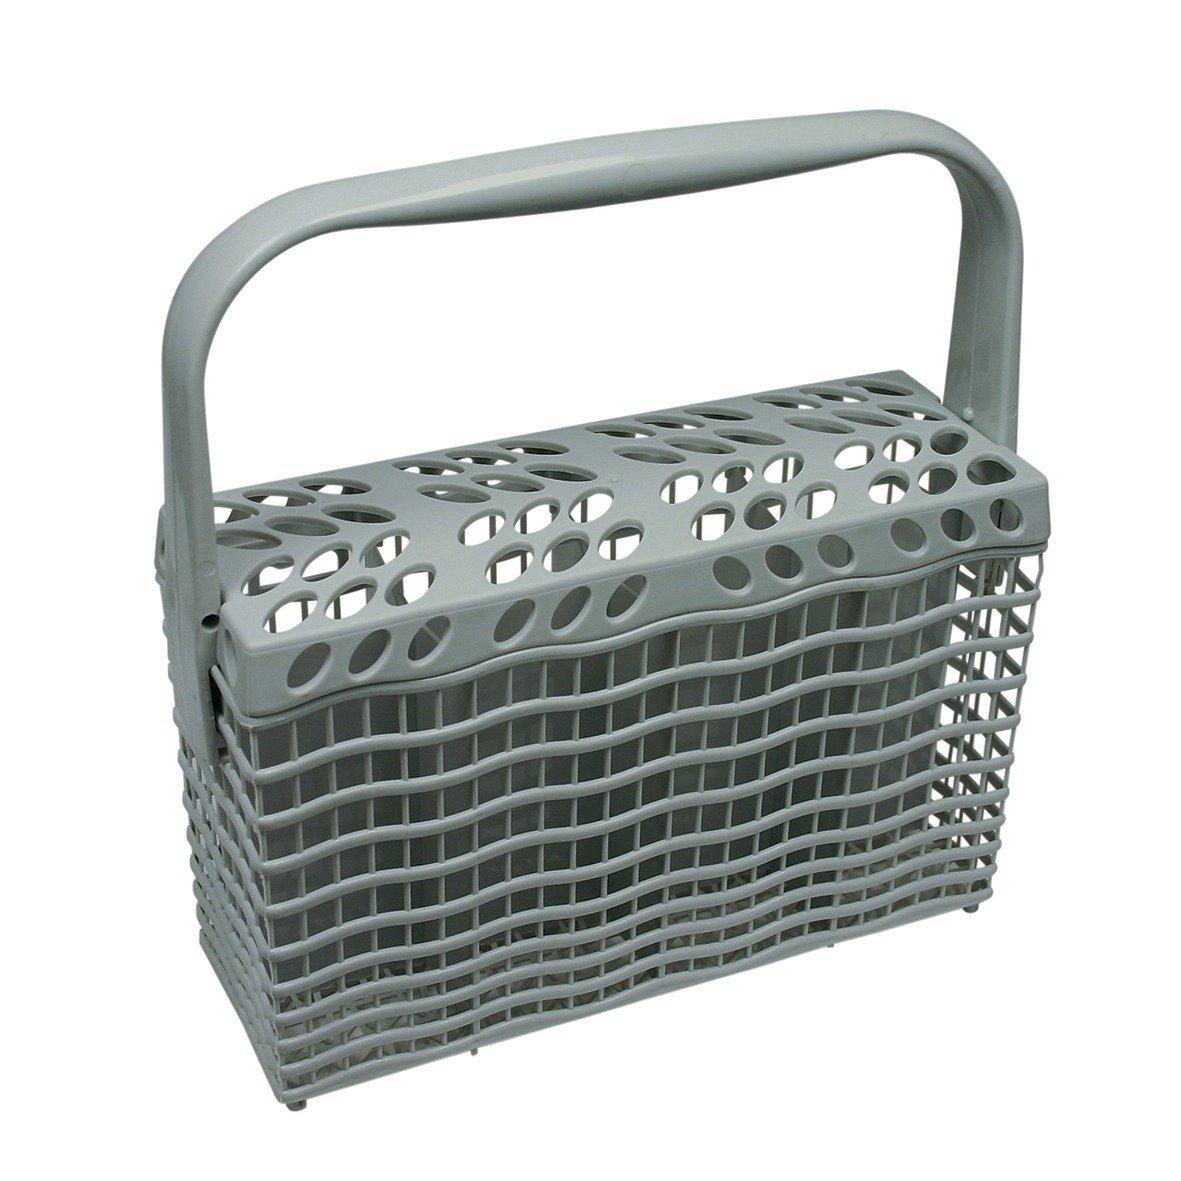 GENUINE ELECTROLUX Dishwasher CUTLERY BASKET Light Grey